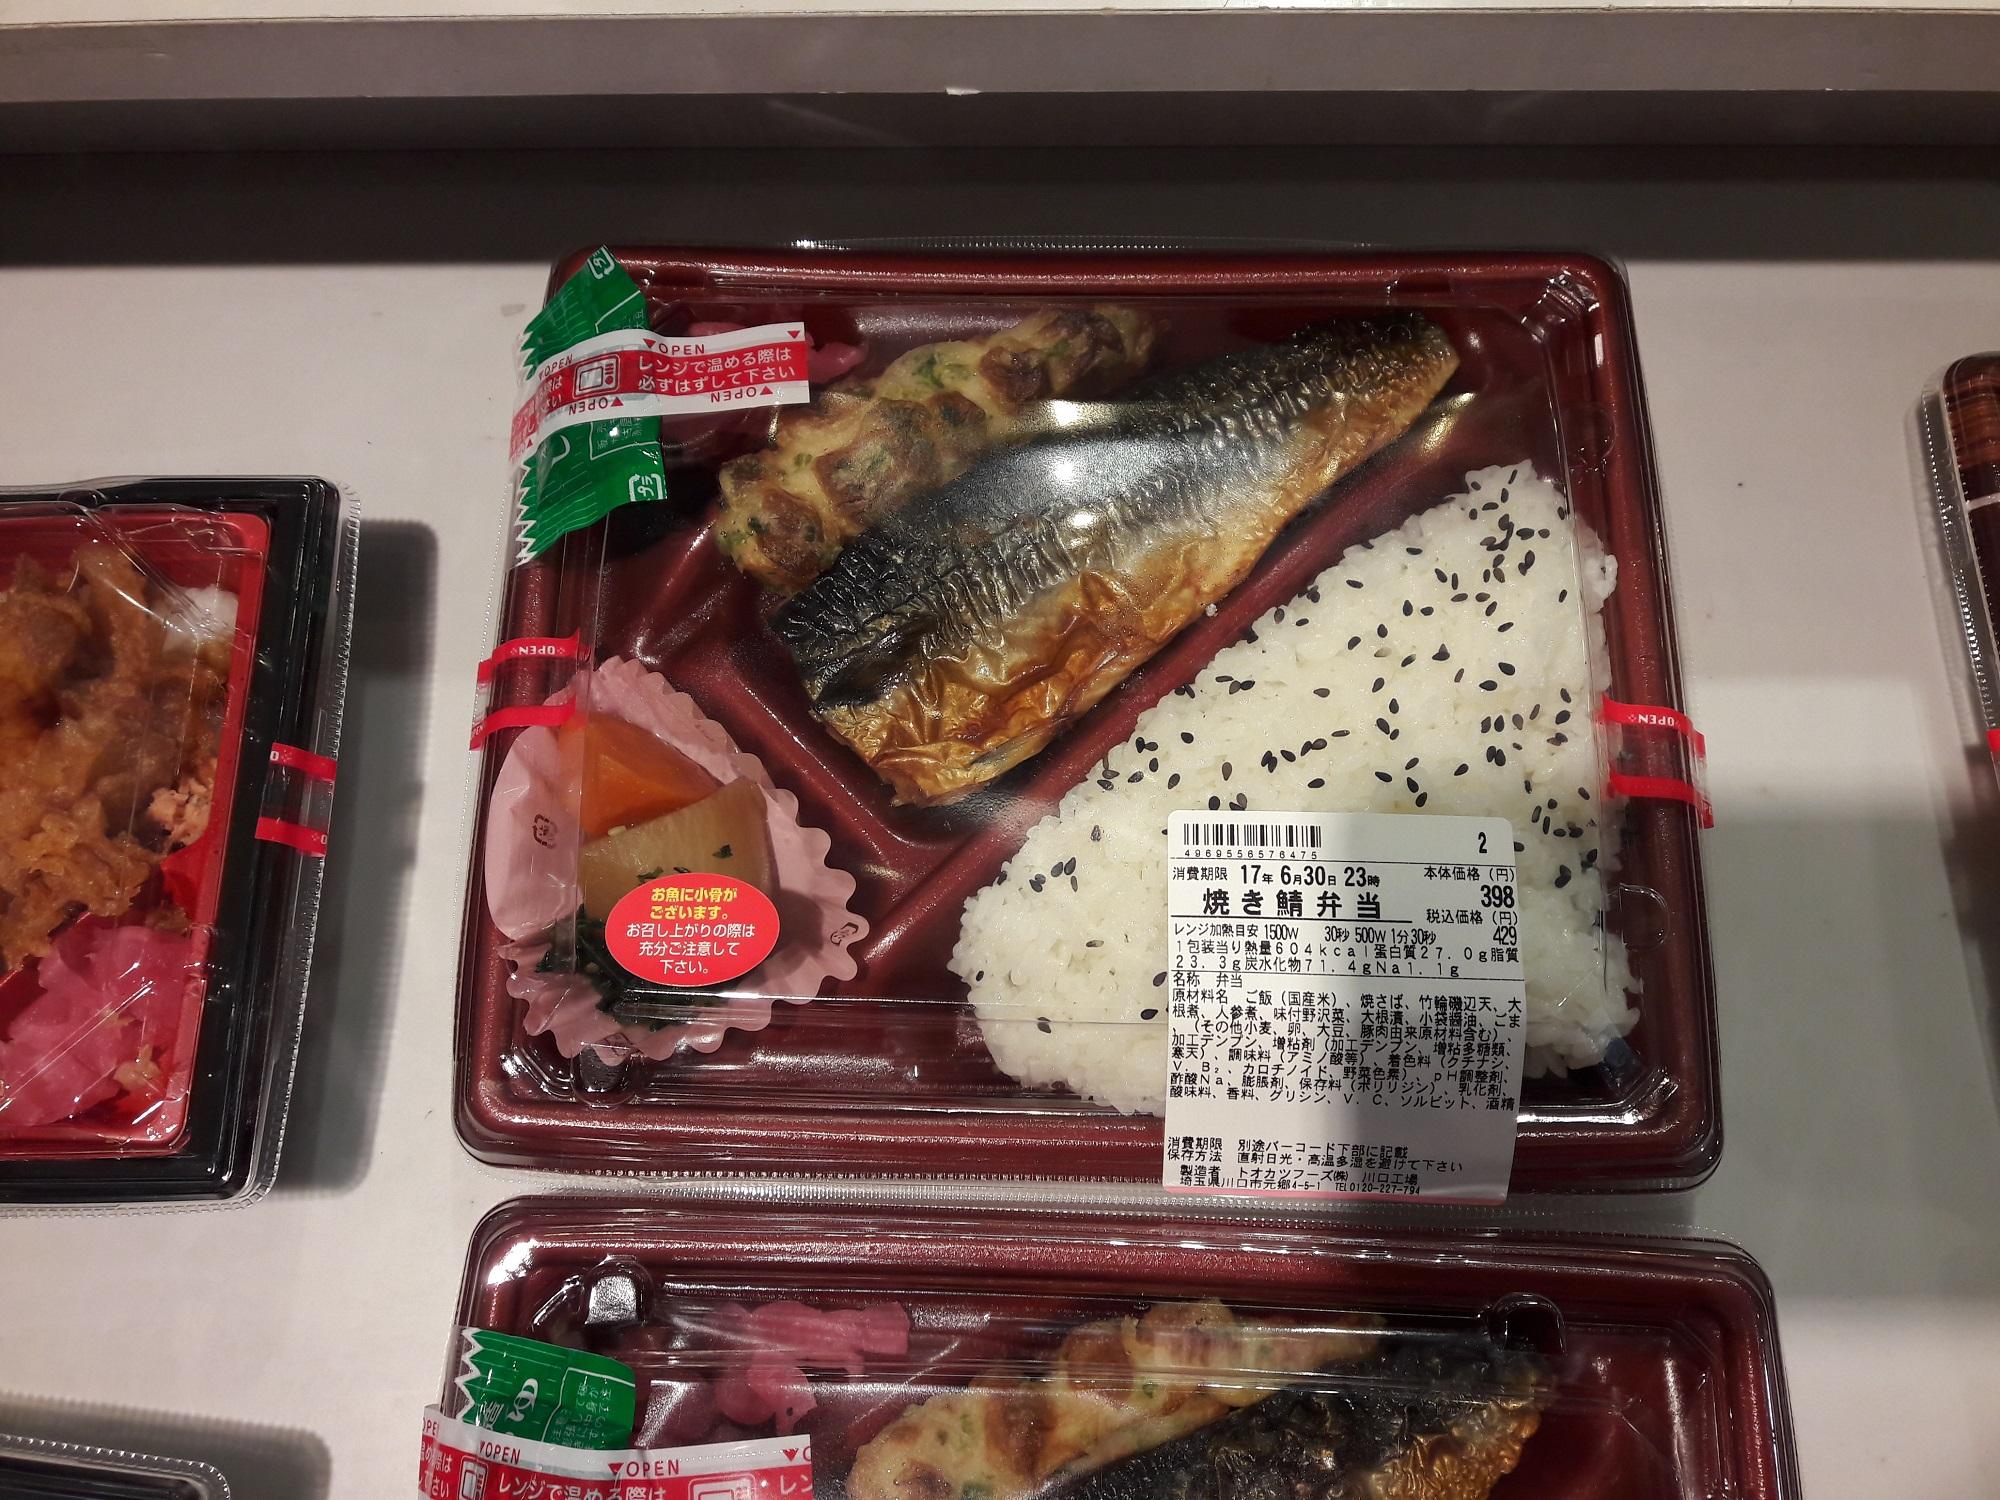 Begini Penampilan Nasi Bungkus Di Jepang Kompasiana Com